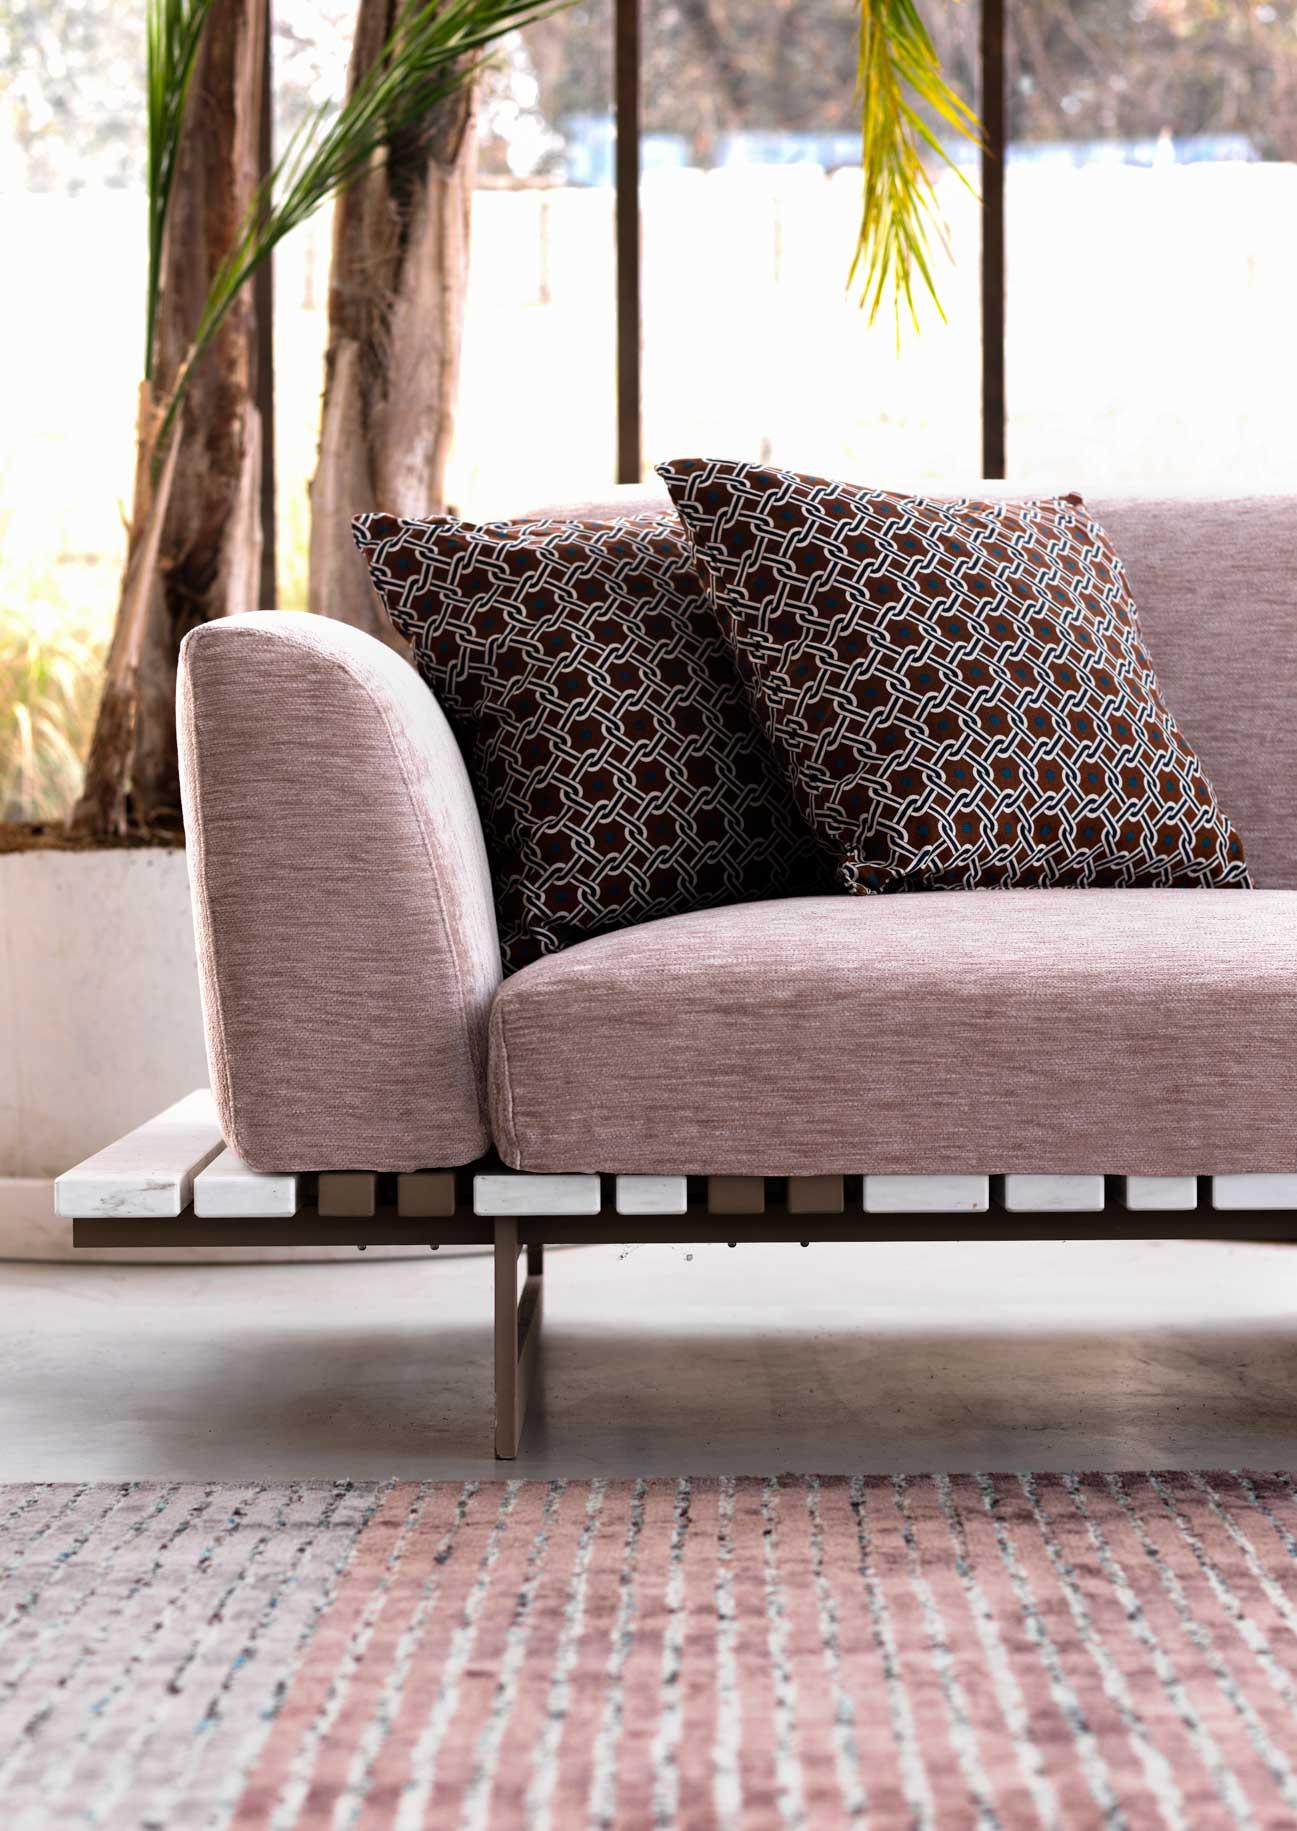 Intnow-Furniture-HomeDesign_Ritagli